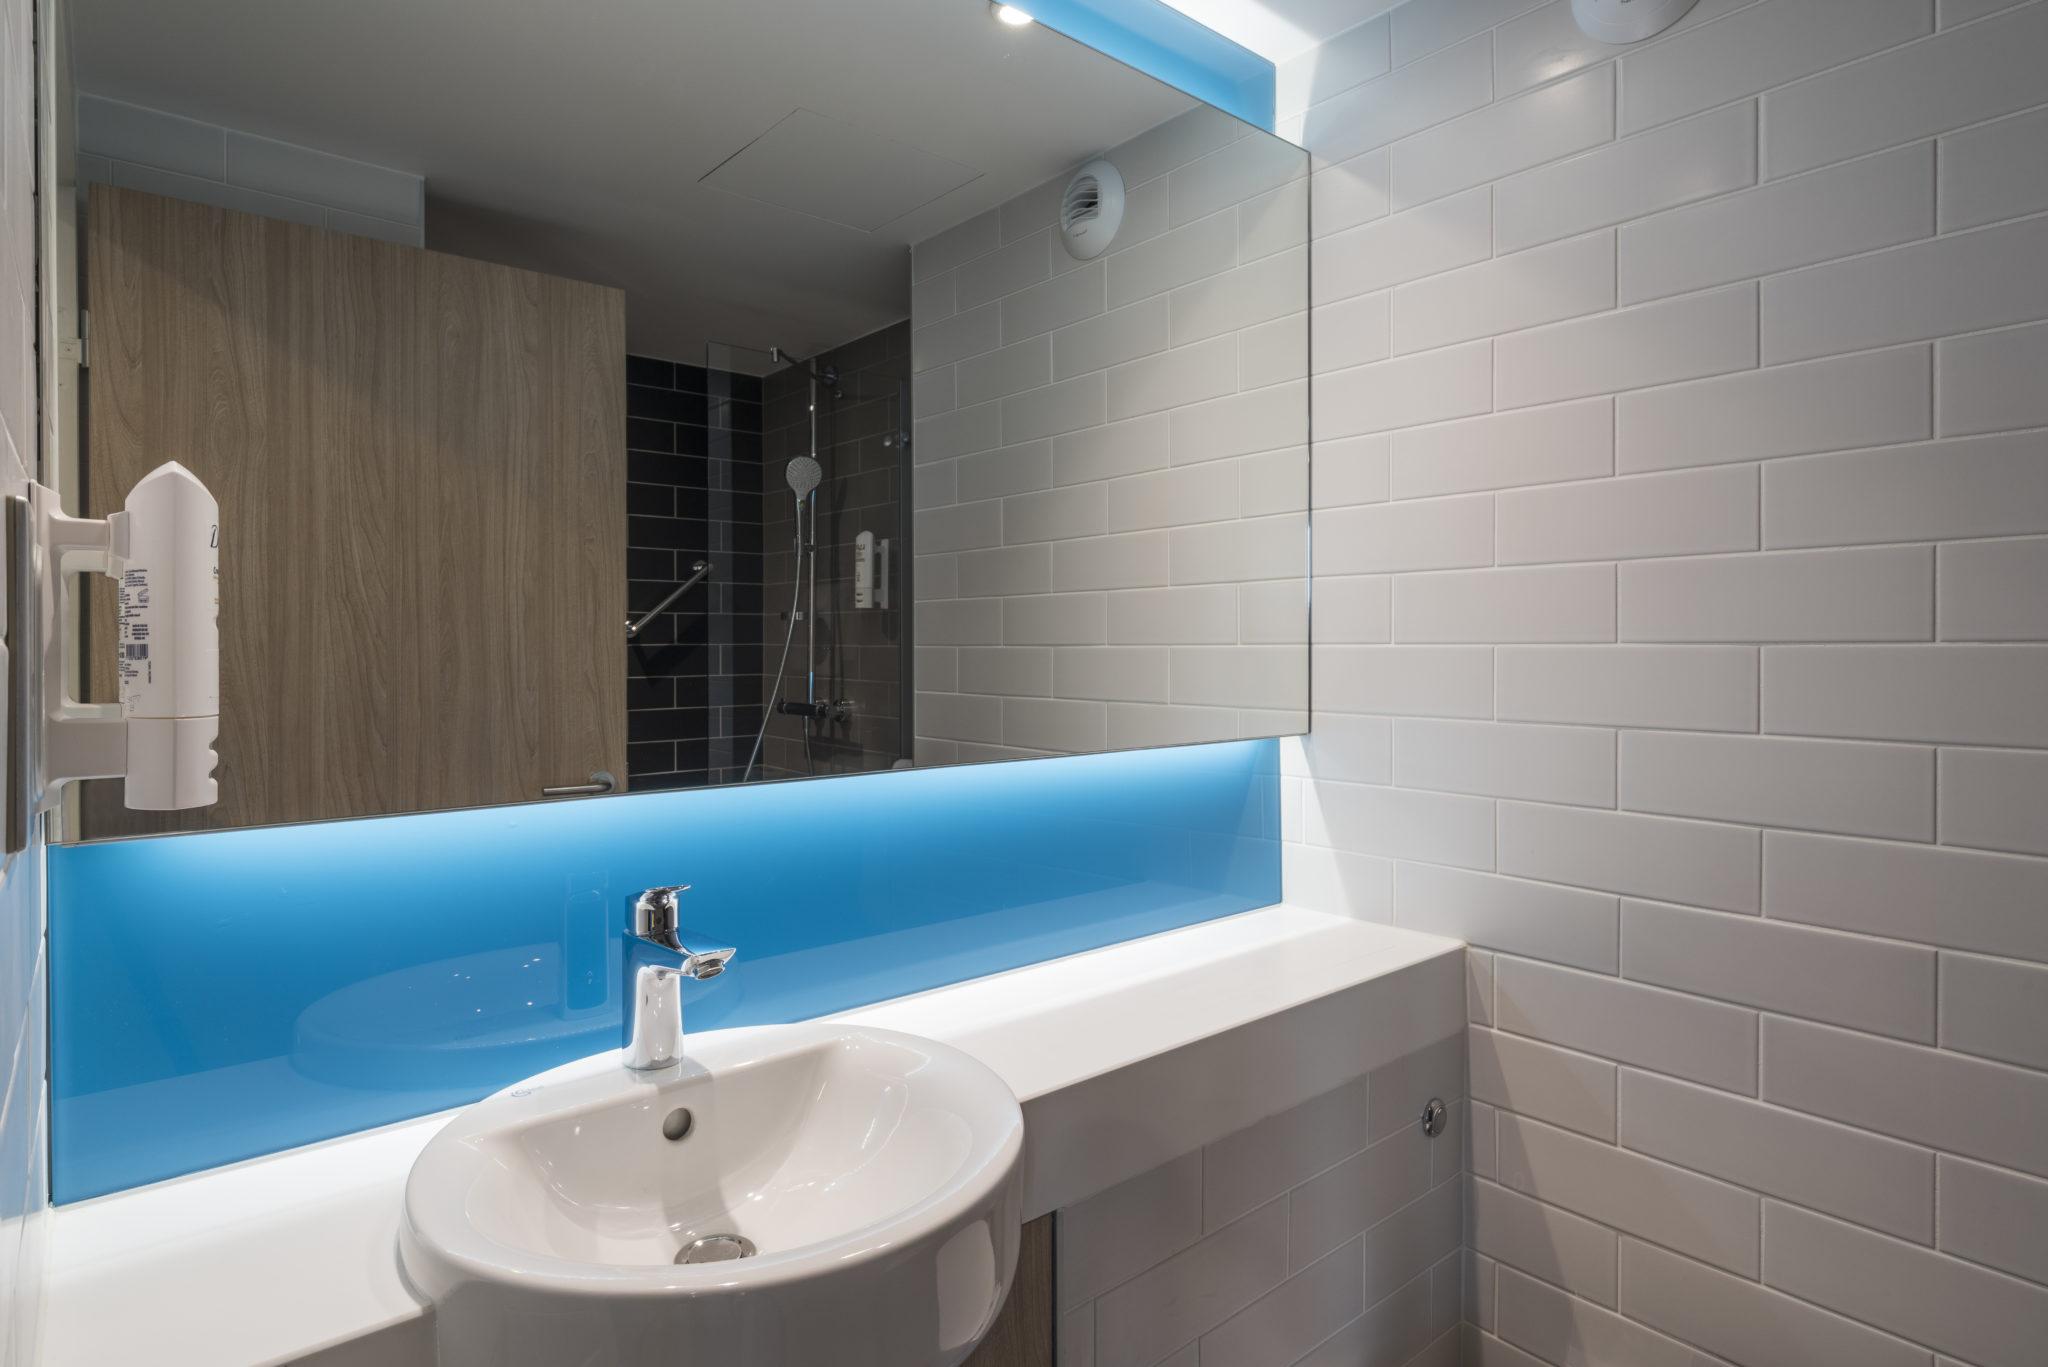 Holiday Inn Express Paris CDG Airport Bathroom